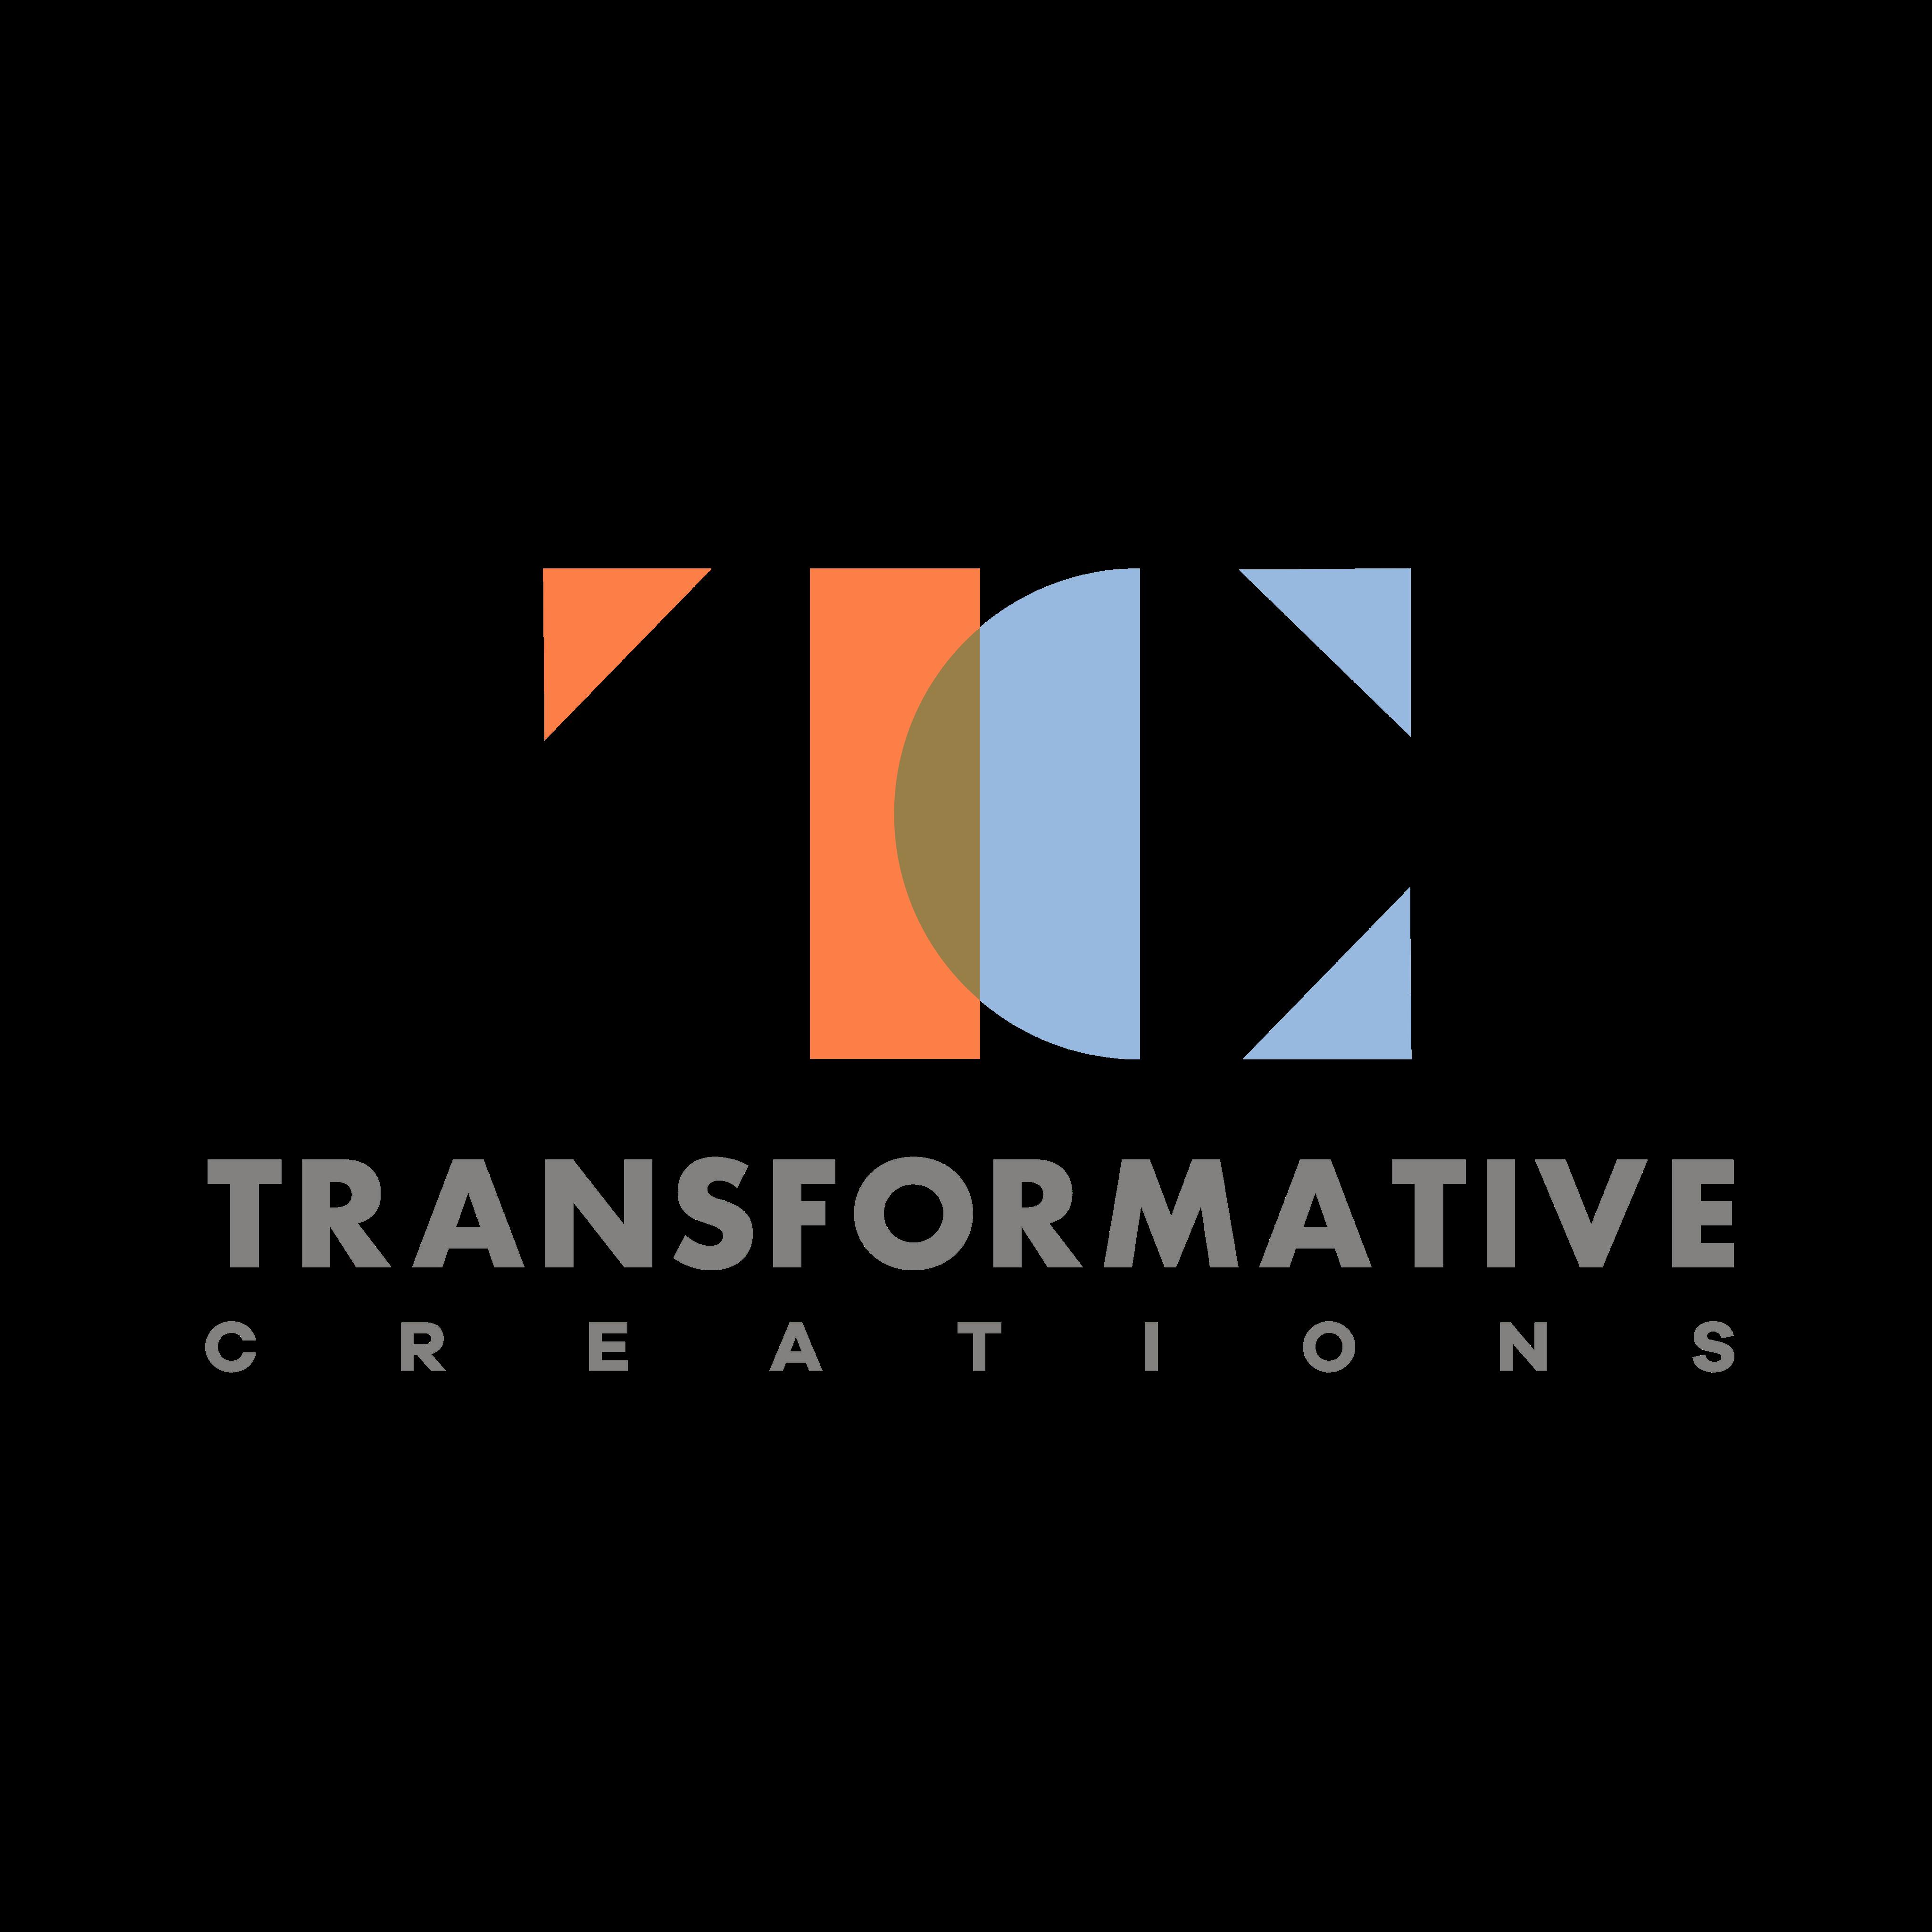 Transformative Creations